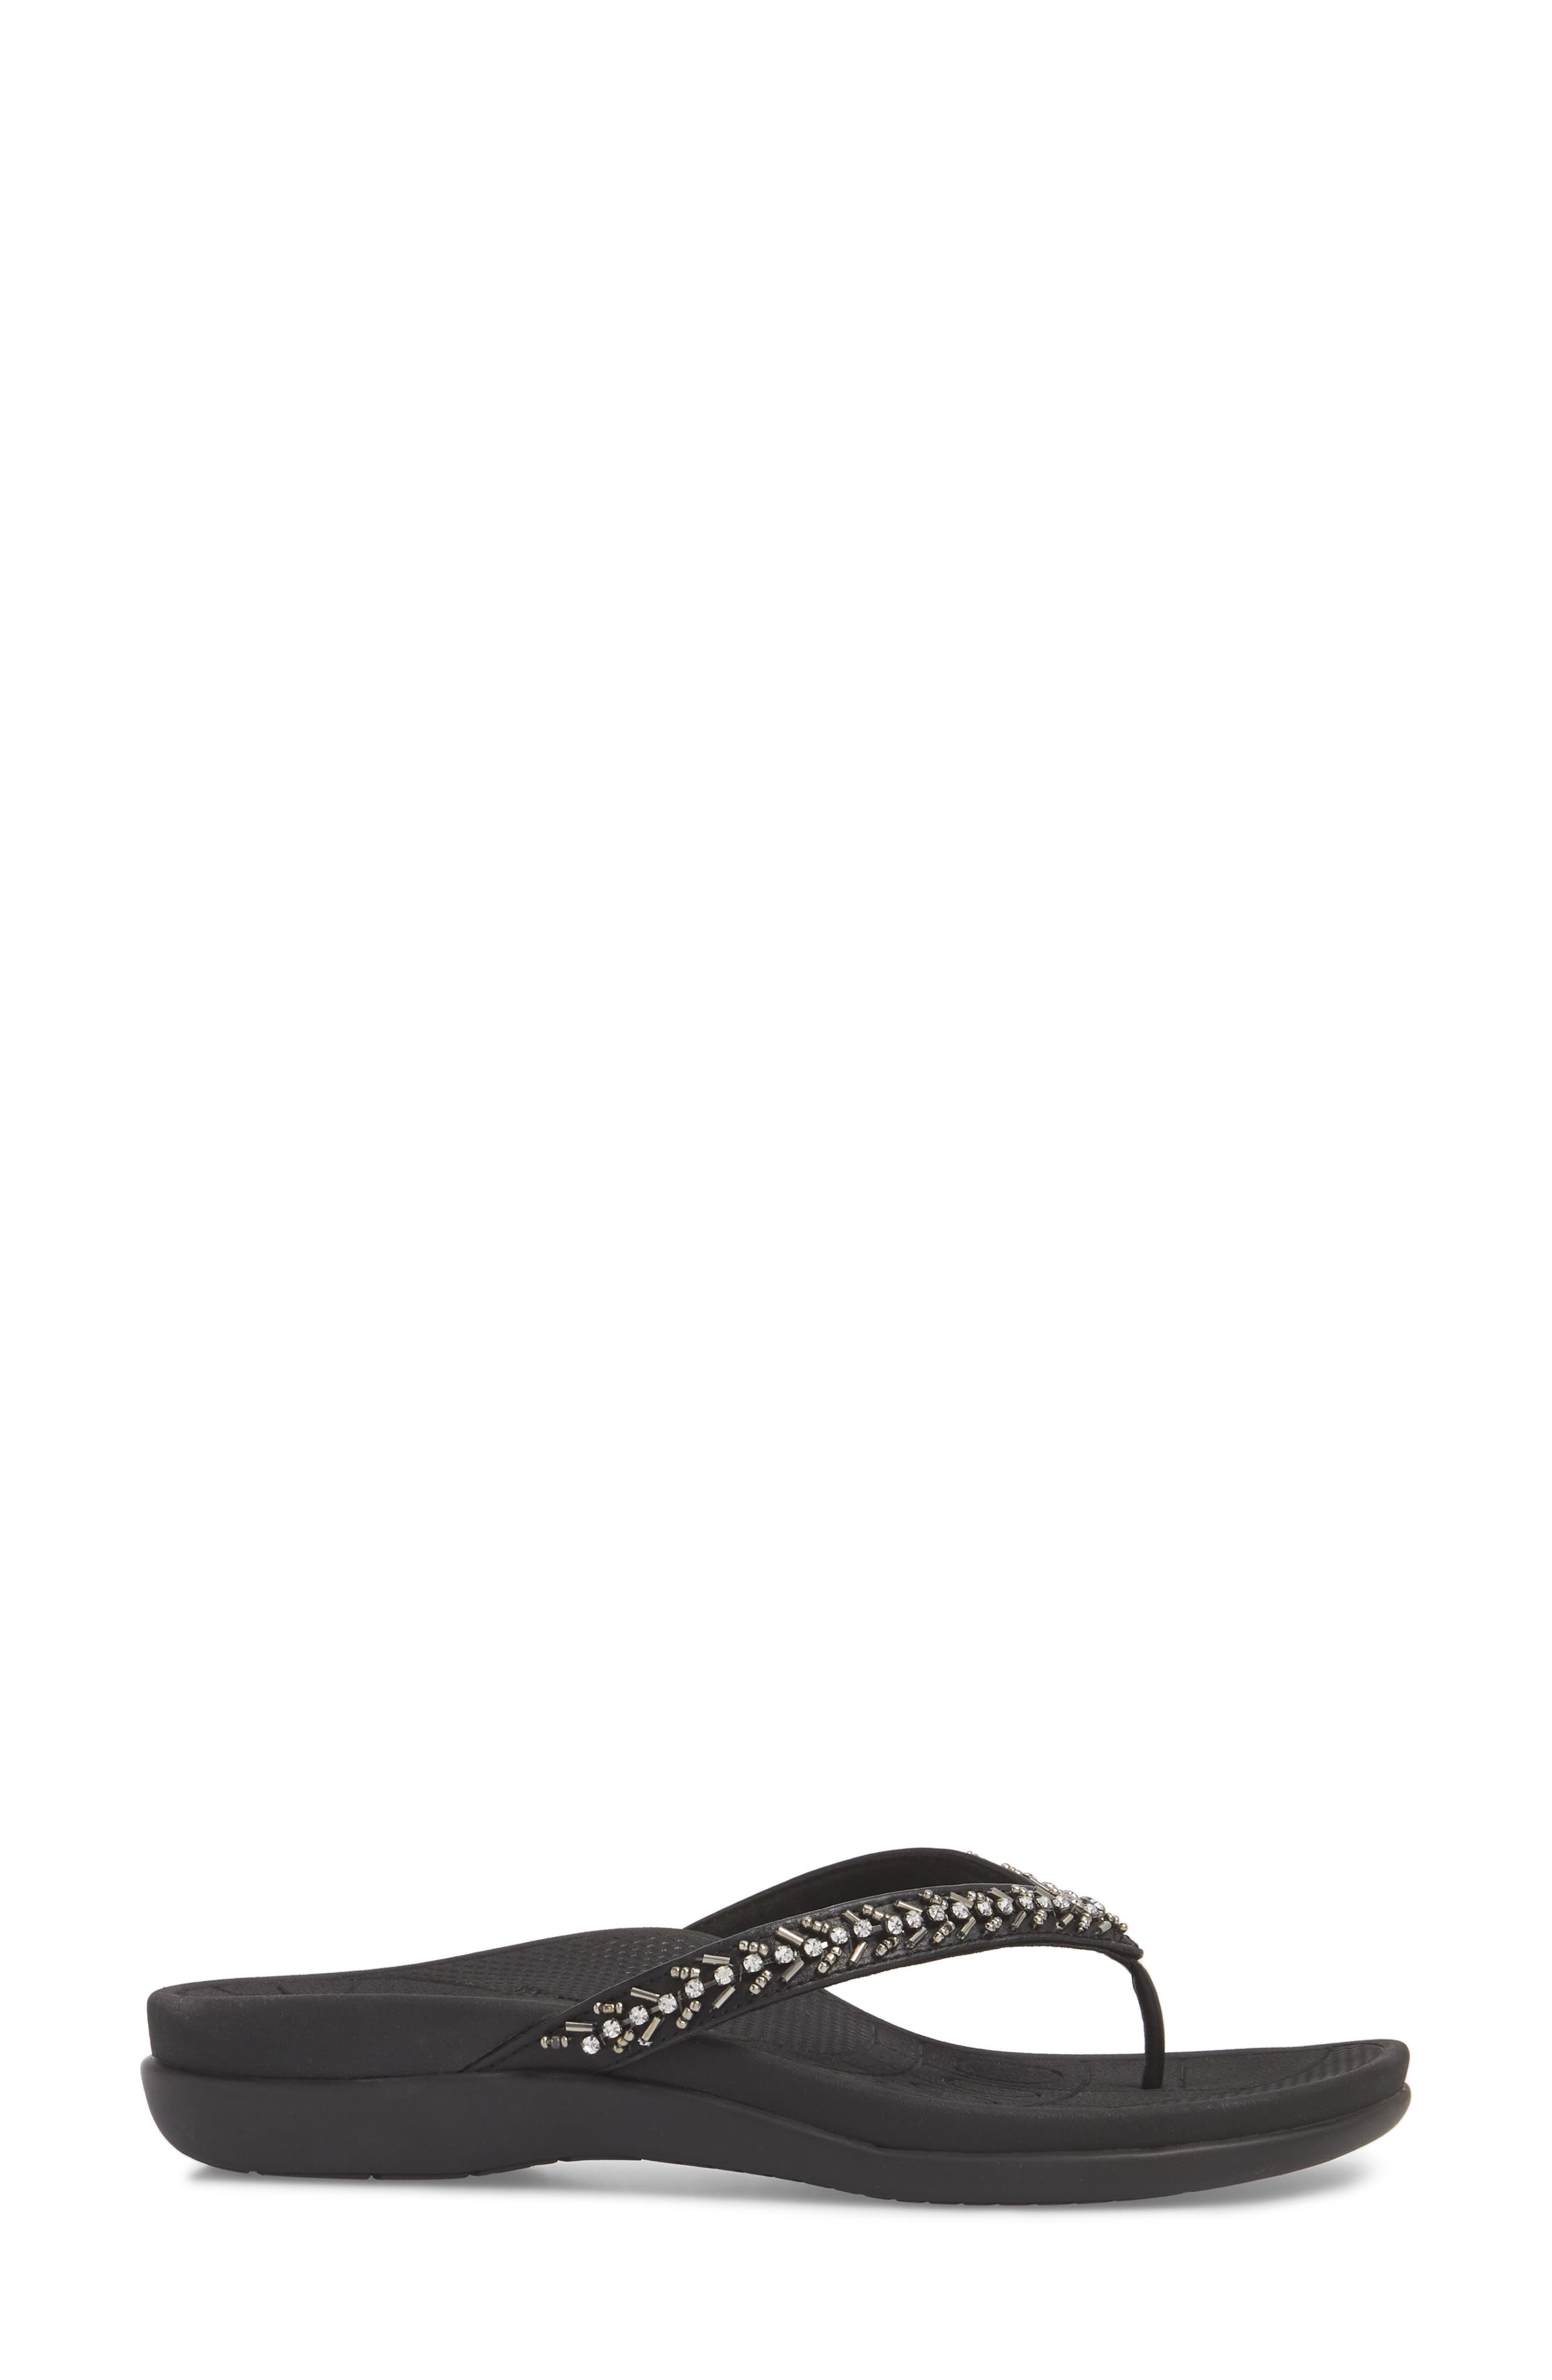 AETREX, Jules Crystal Embellished Water Friendly Flip-Flop, Alternate thumbnail 3, color, BLACK